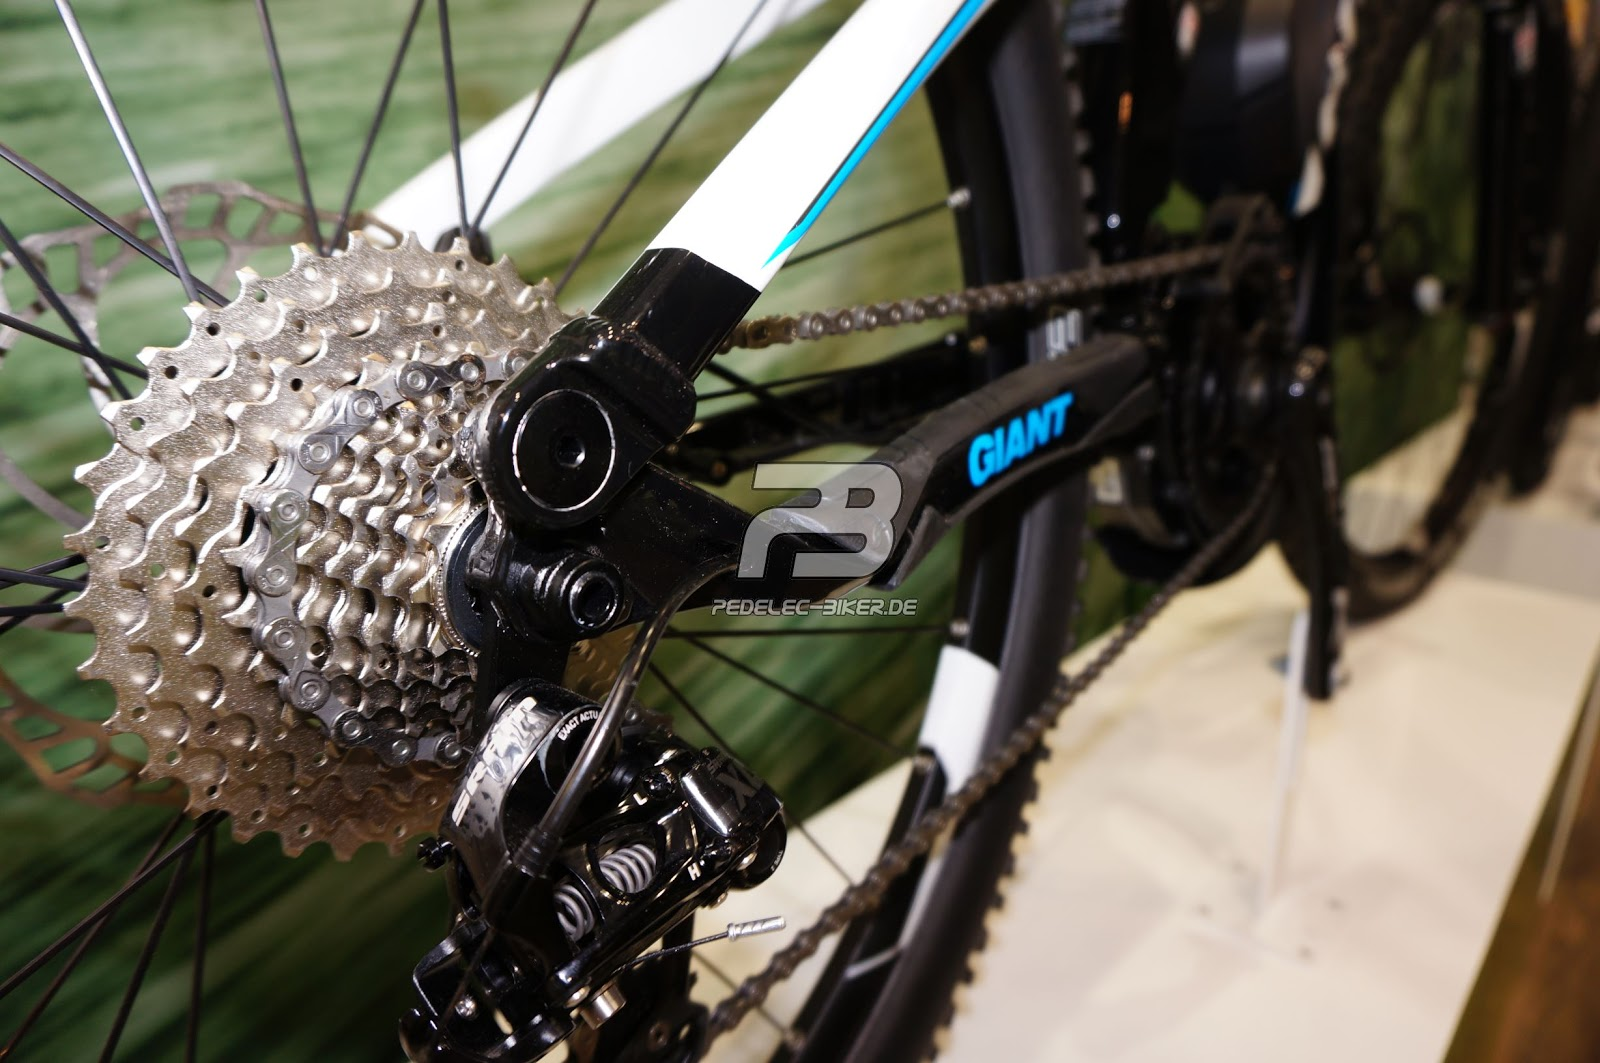 Pedelec-Biker.de: Eurobike: Giant Full E+ Serie  Pedelec-Biker.d...